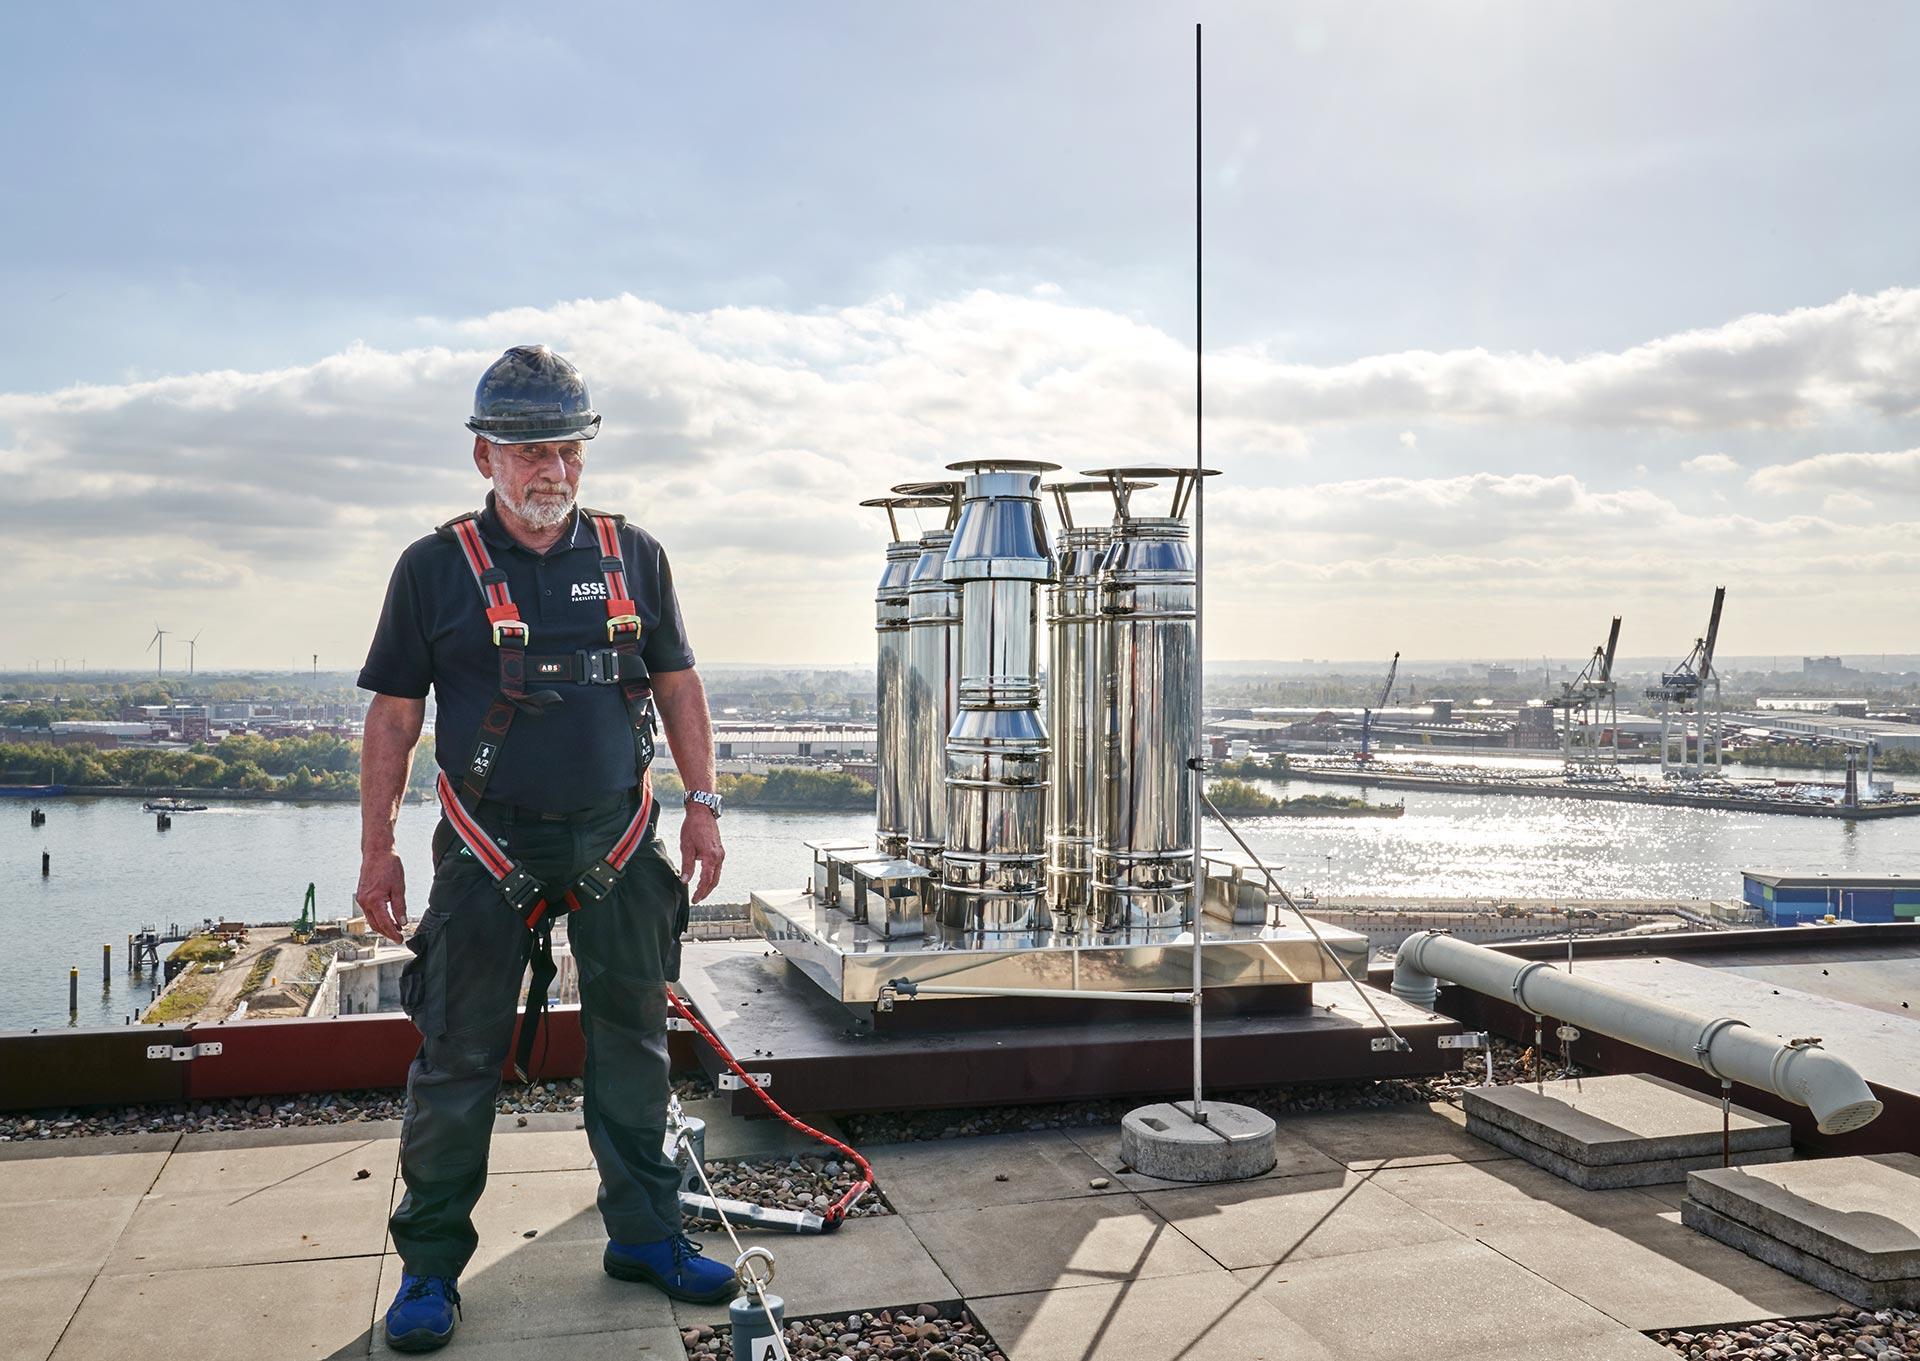 Corporatefotografie - auf Hamburgs Dächern